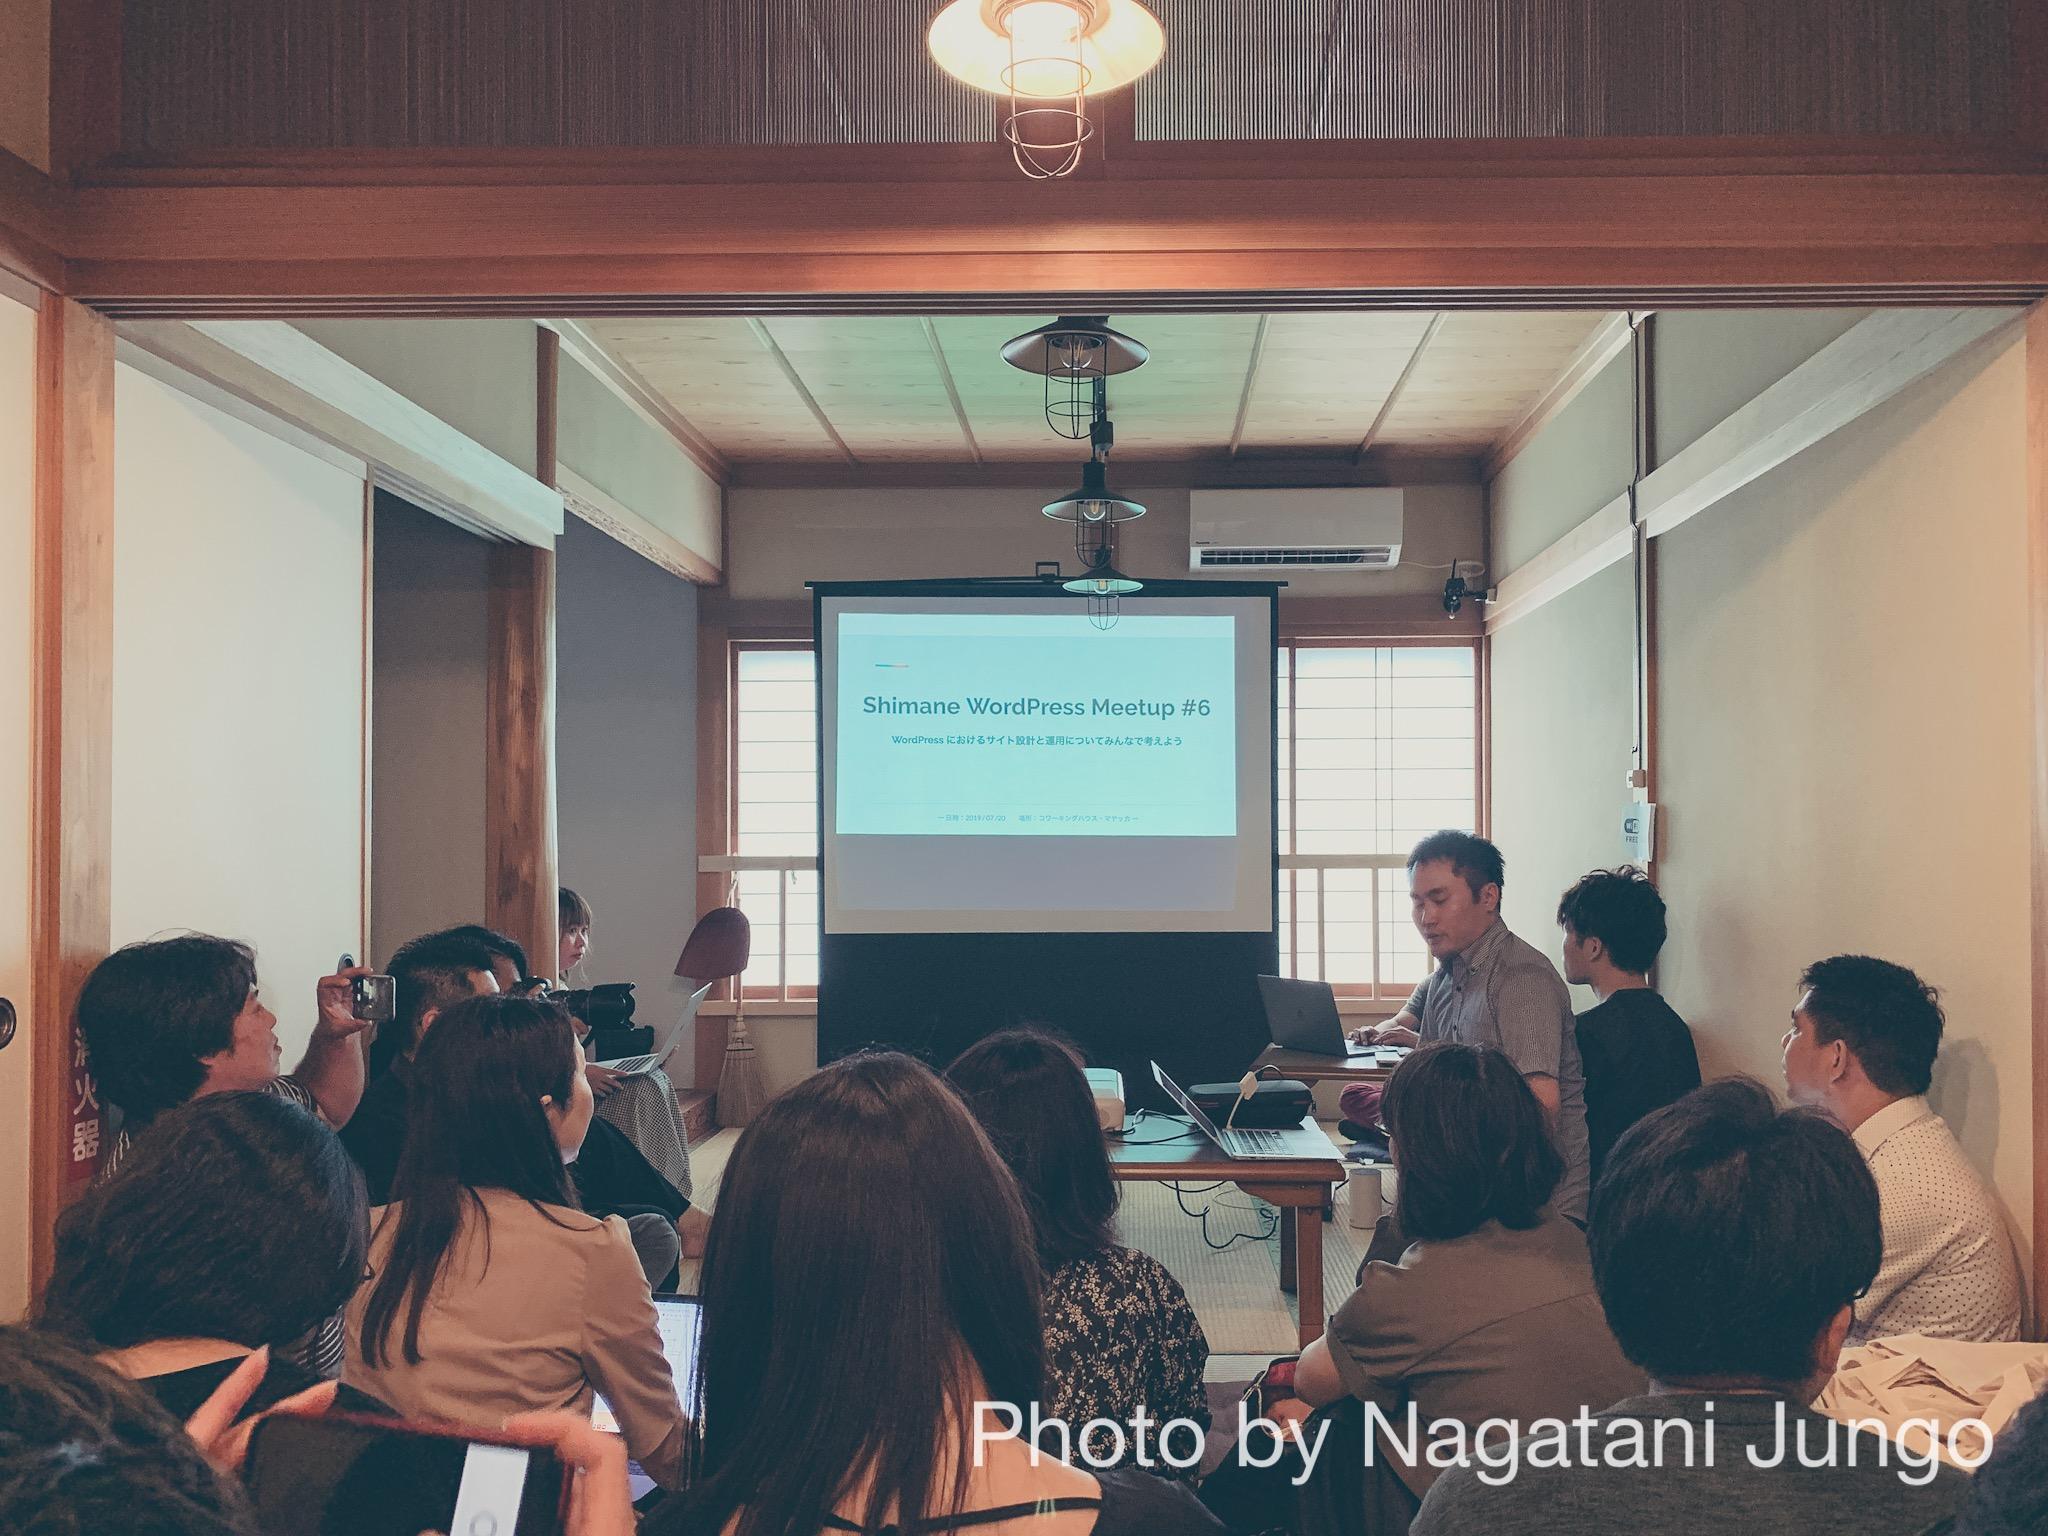 Shimane WordPress Meetup #6